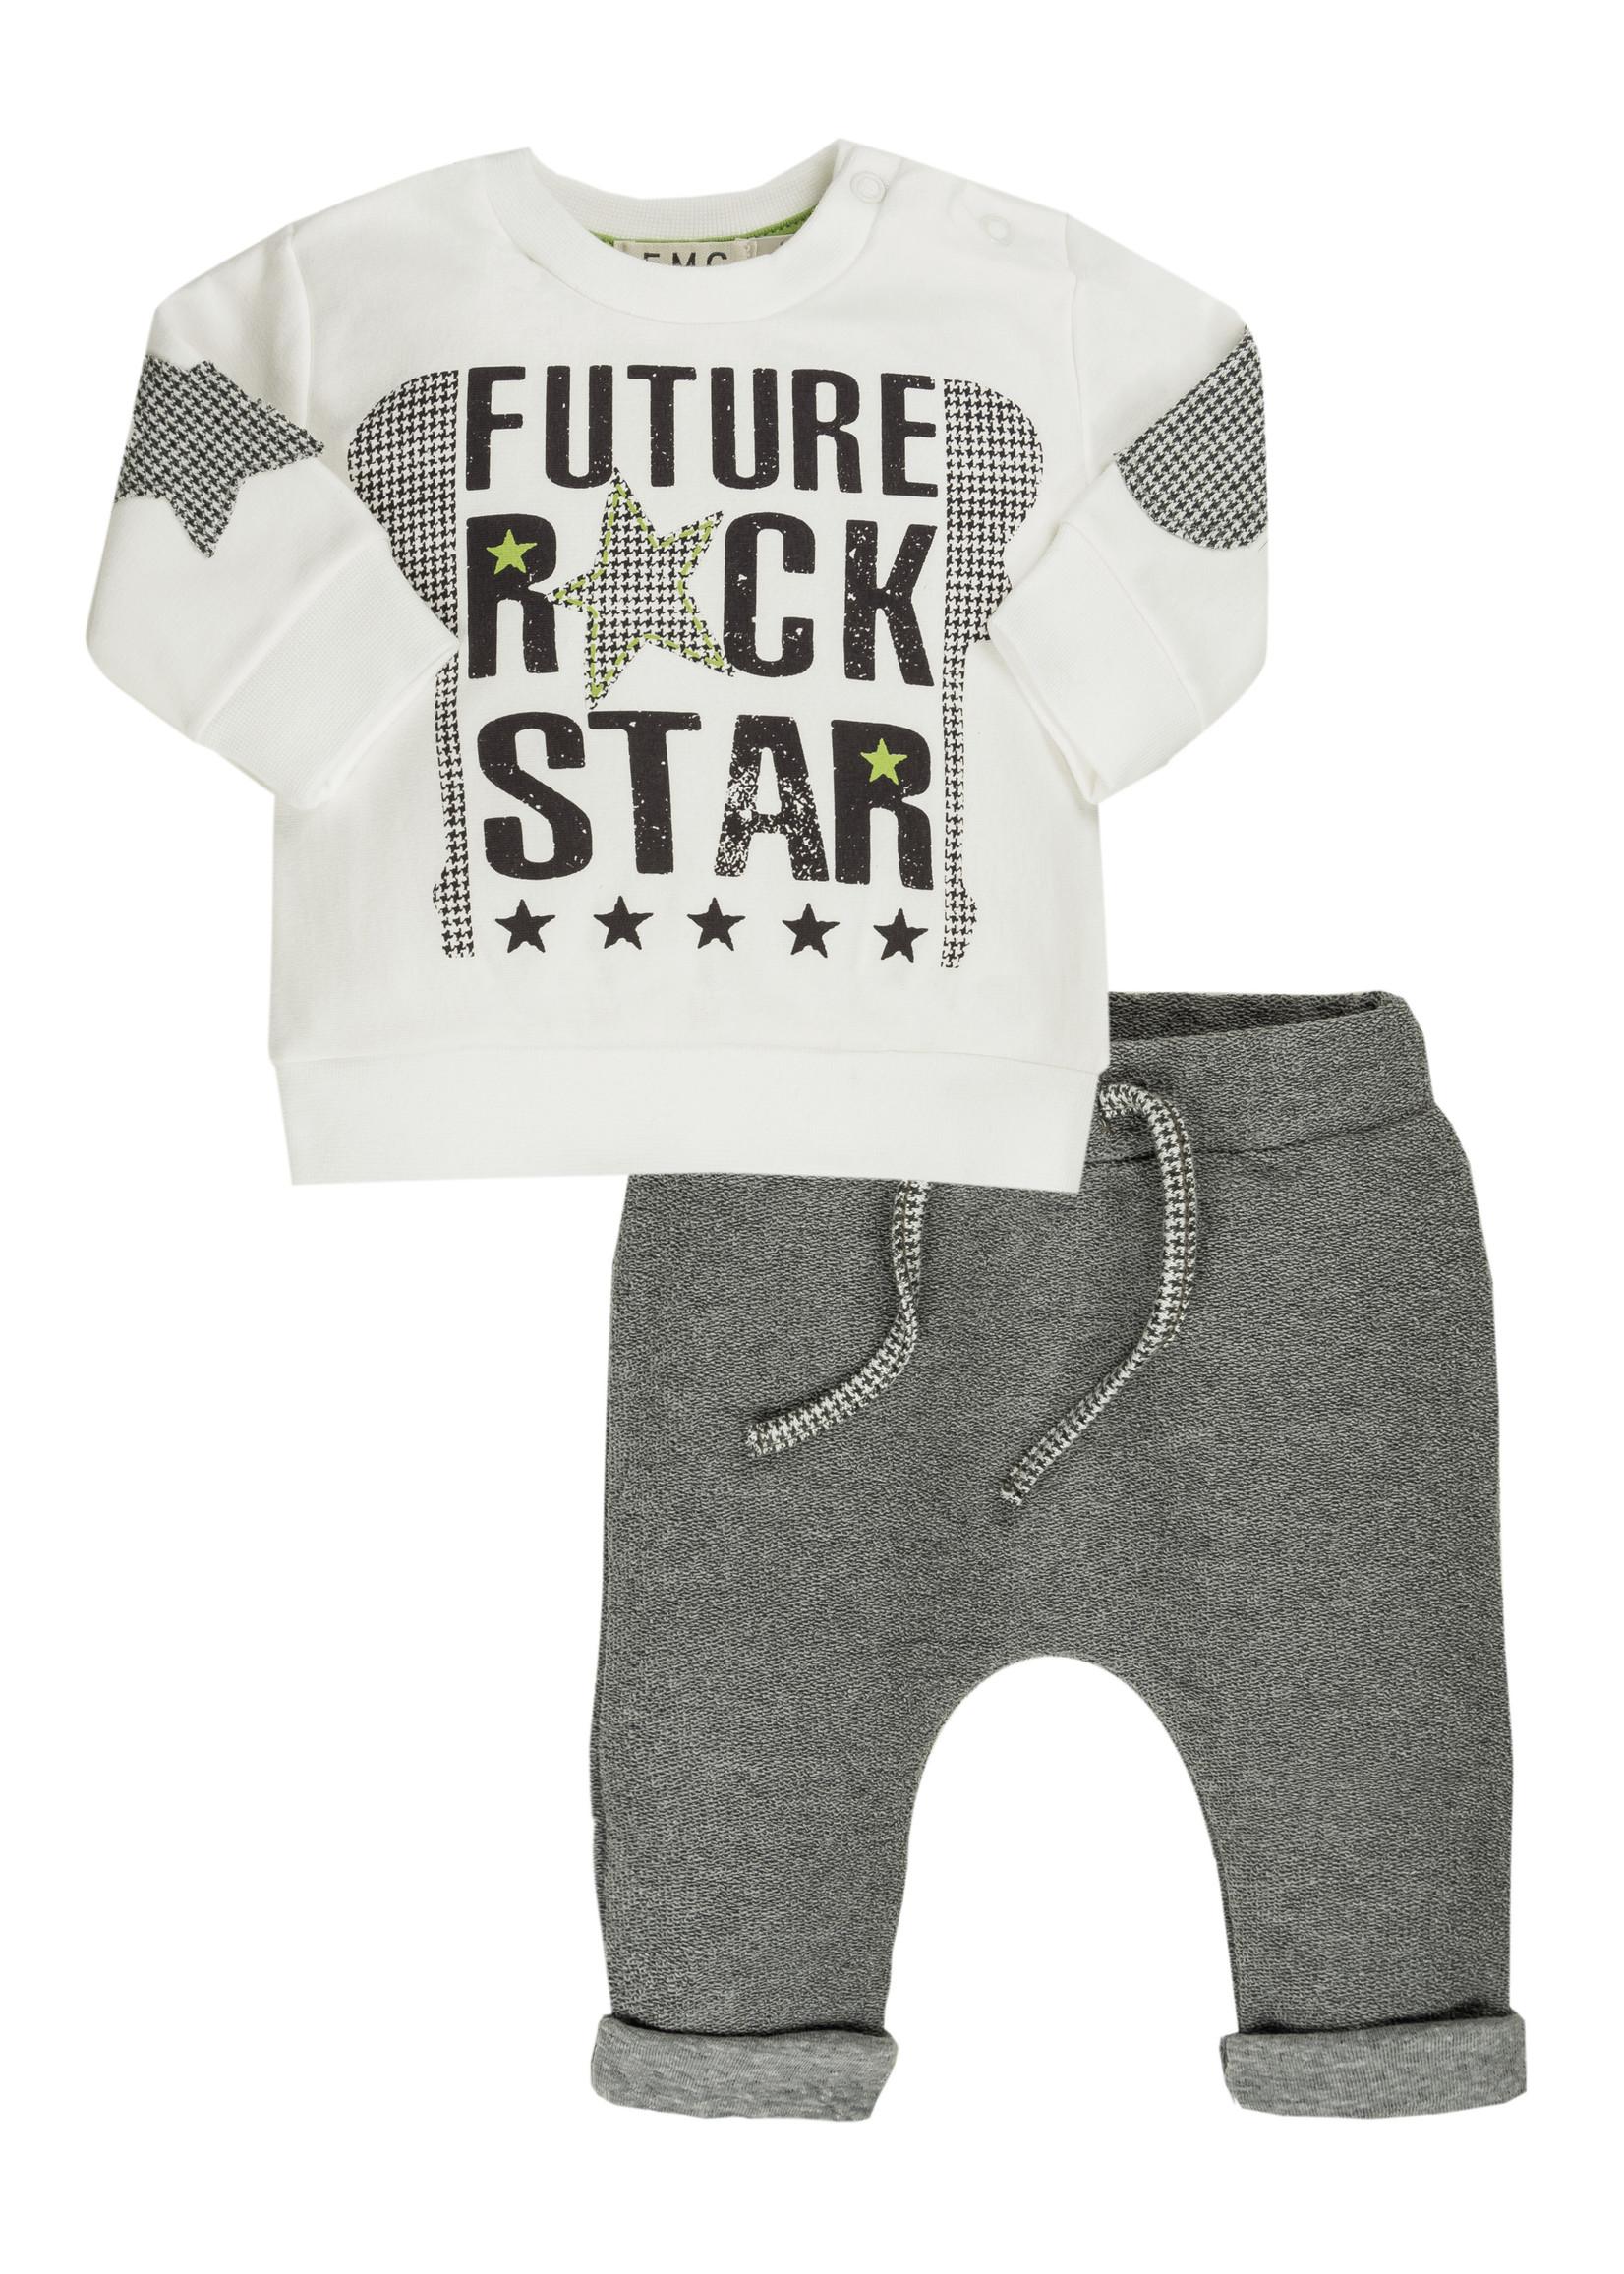 EMC EMC future rock star set